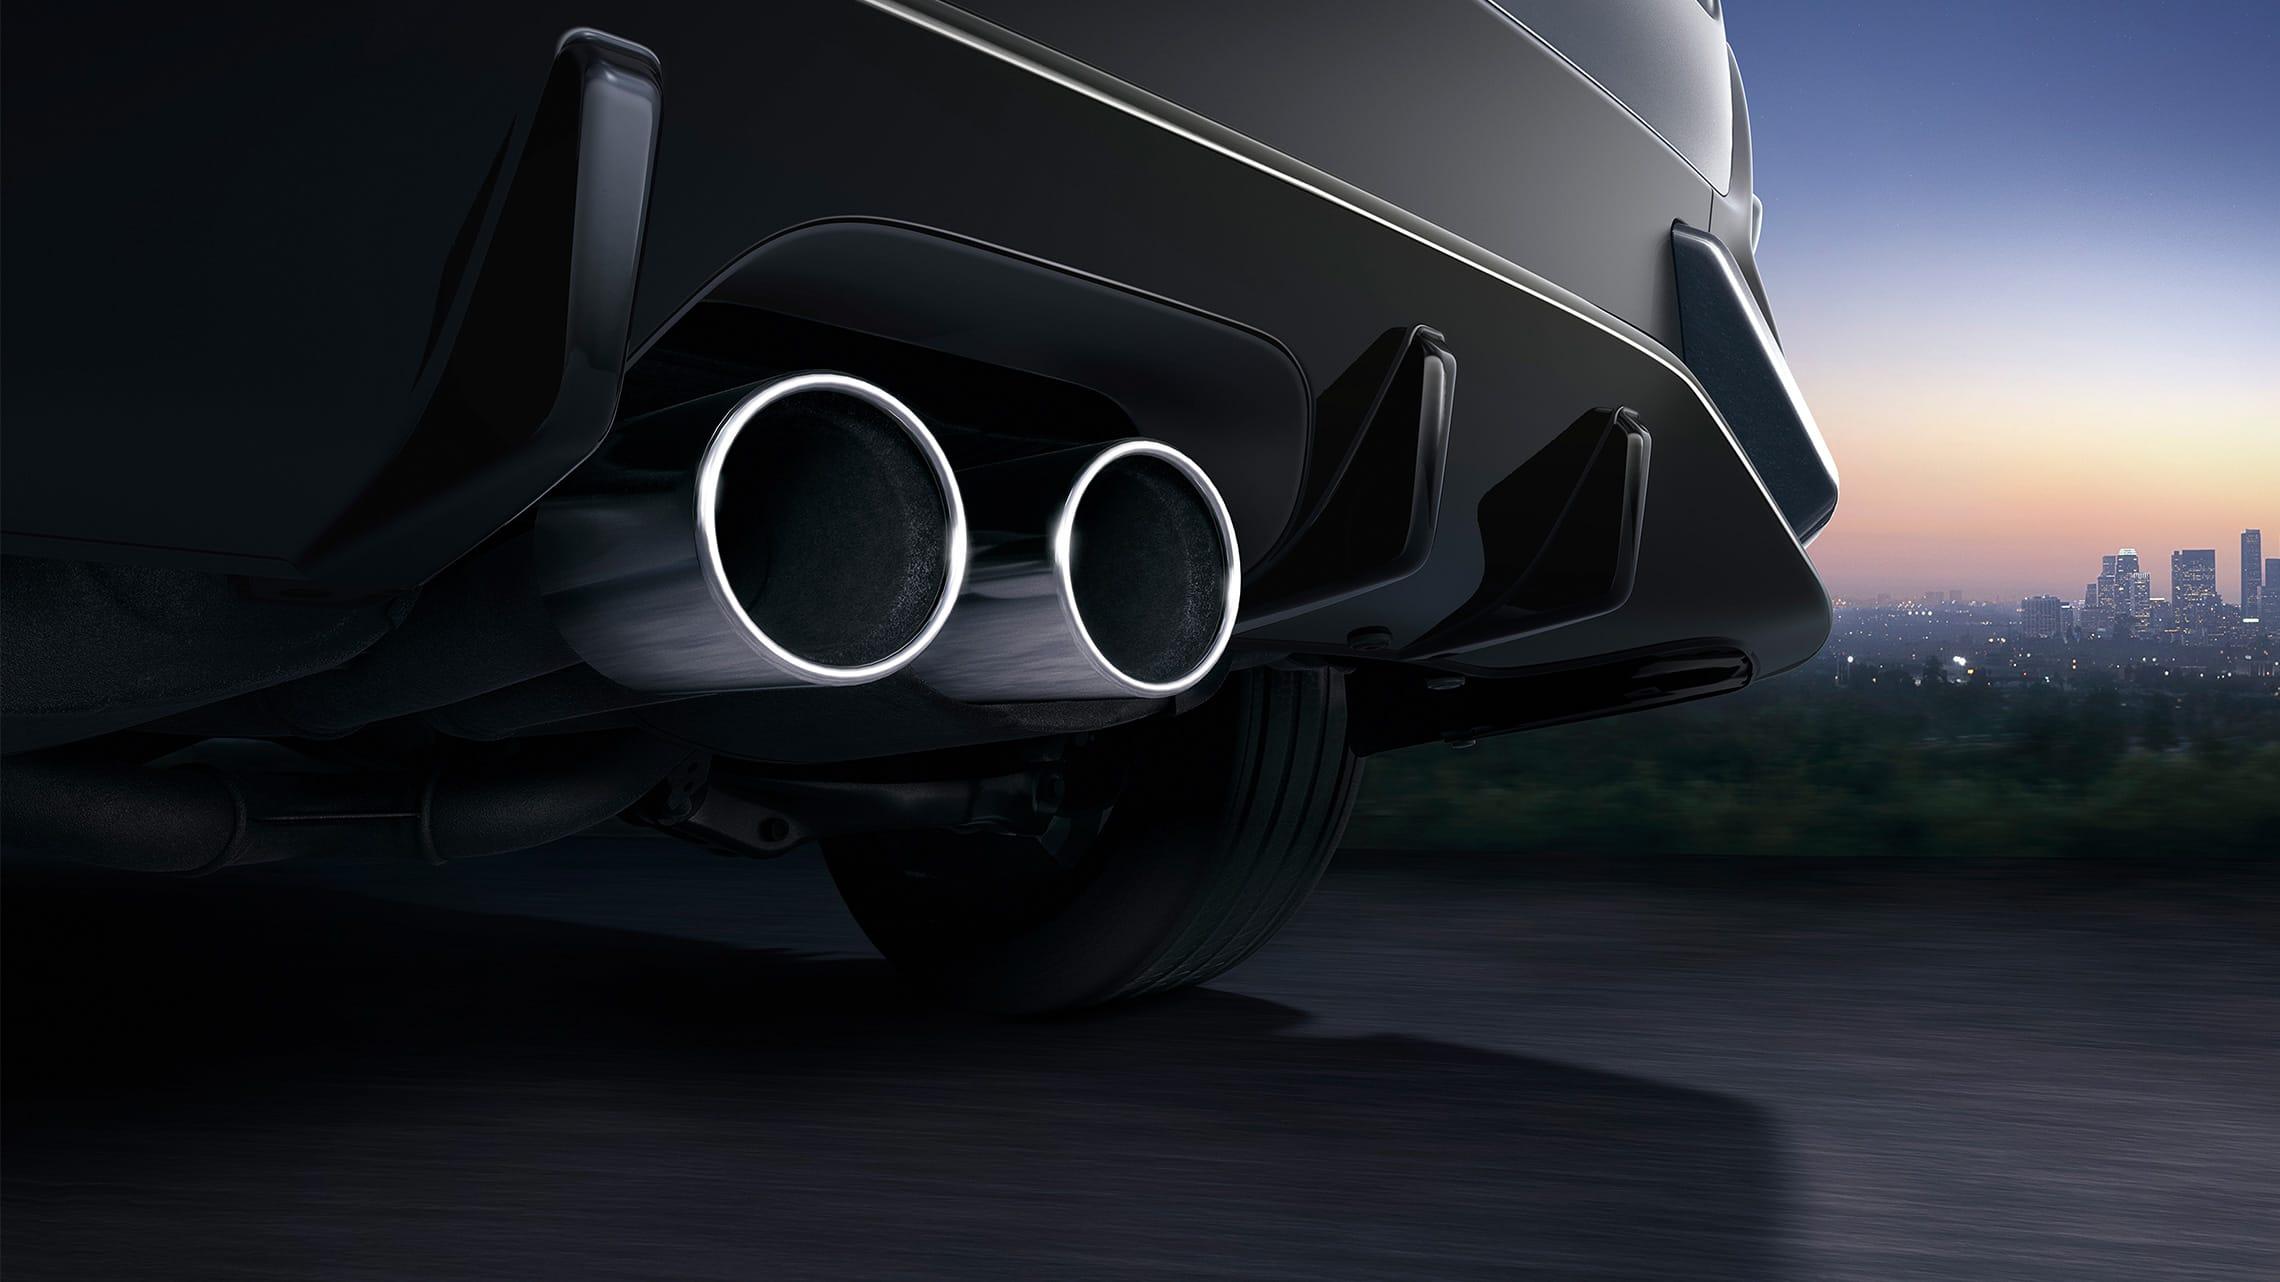 Salida de escape doble central en el Honda Civic Sport Touring Hatchback2020 en Sonic Gray Pearl.